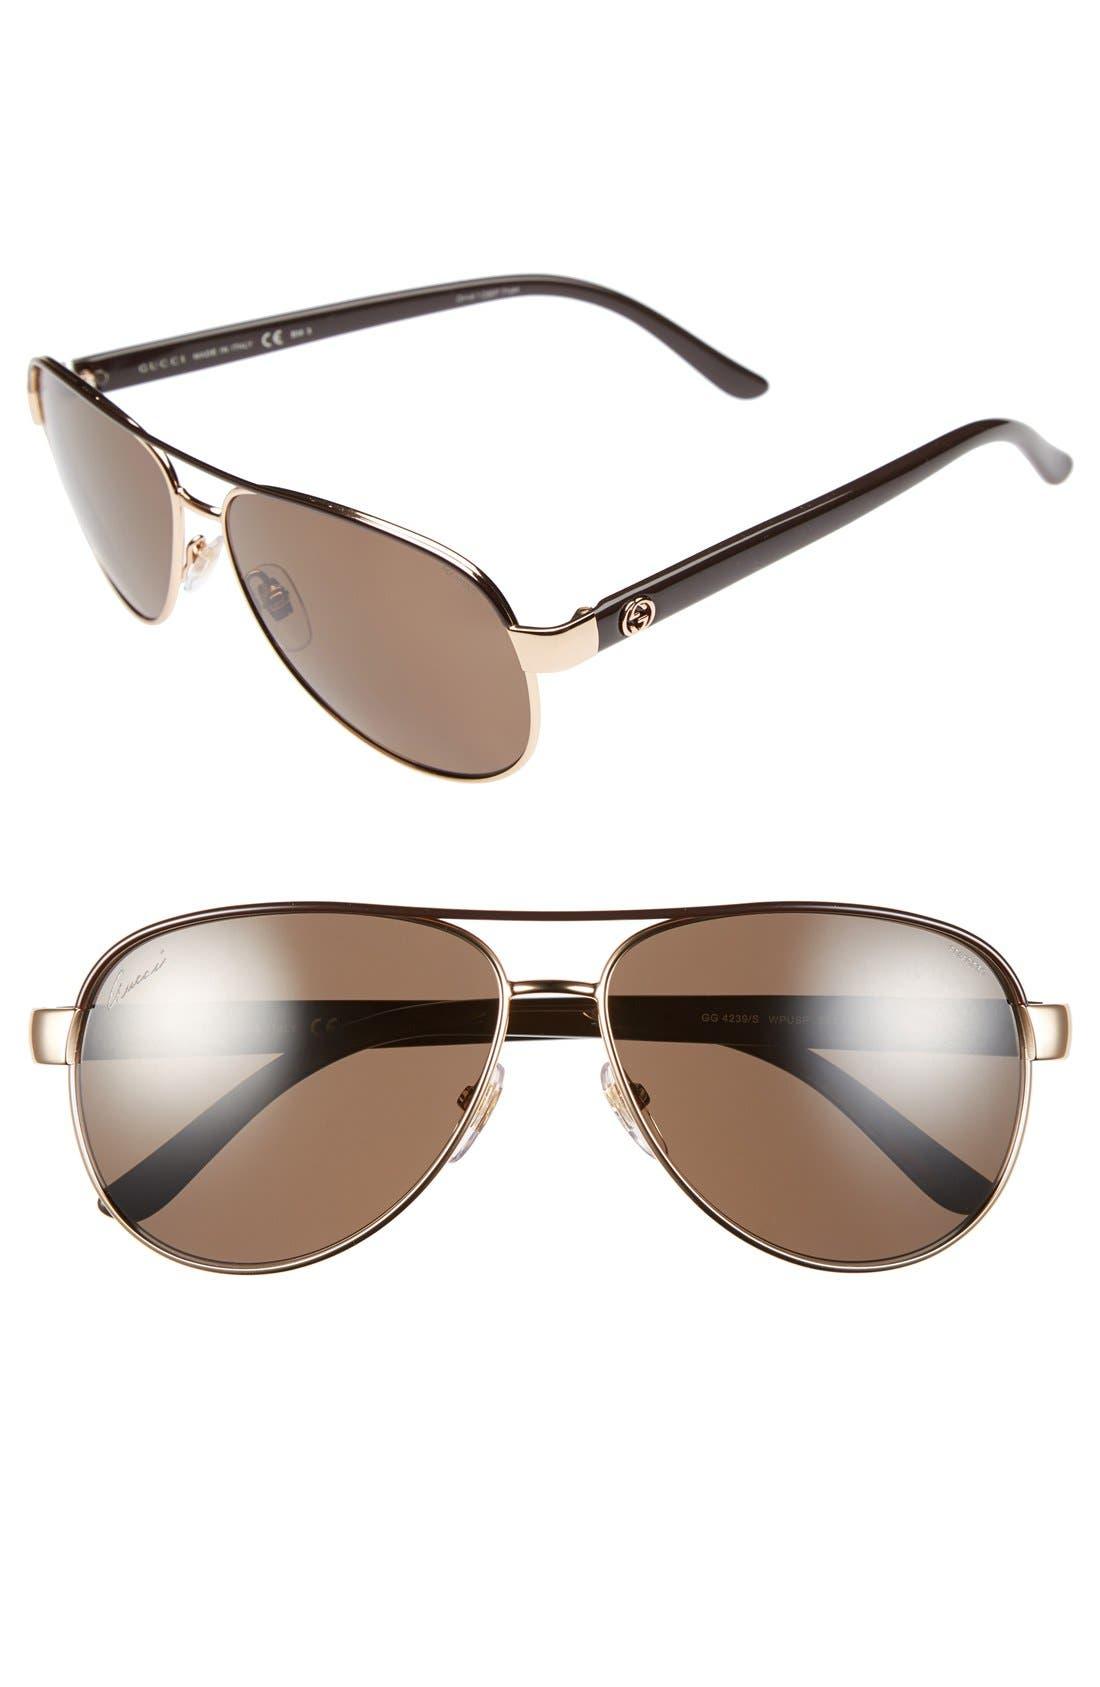 Main Image - Gucci 58mm Polarized Aviator Sunglasses